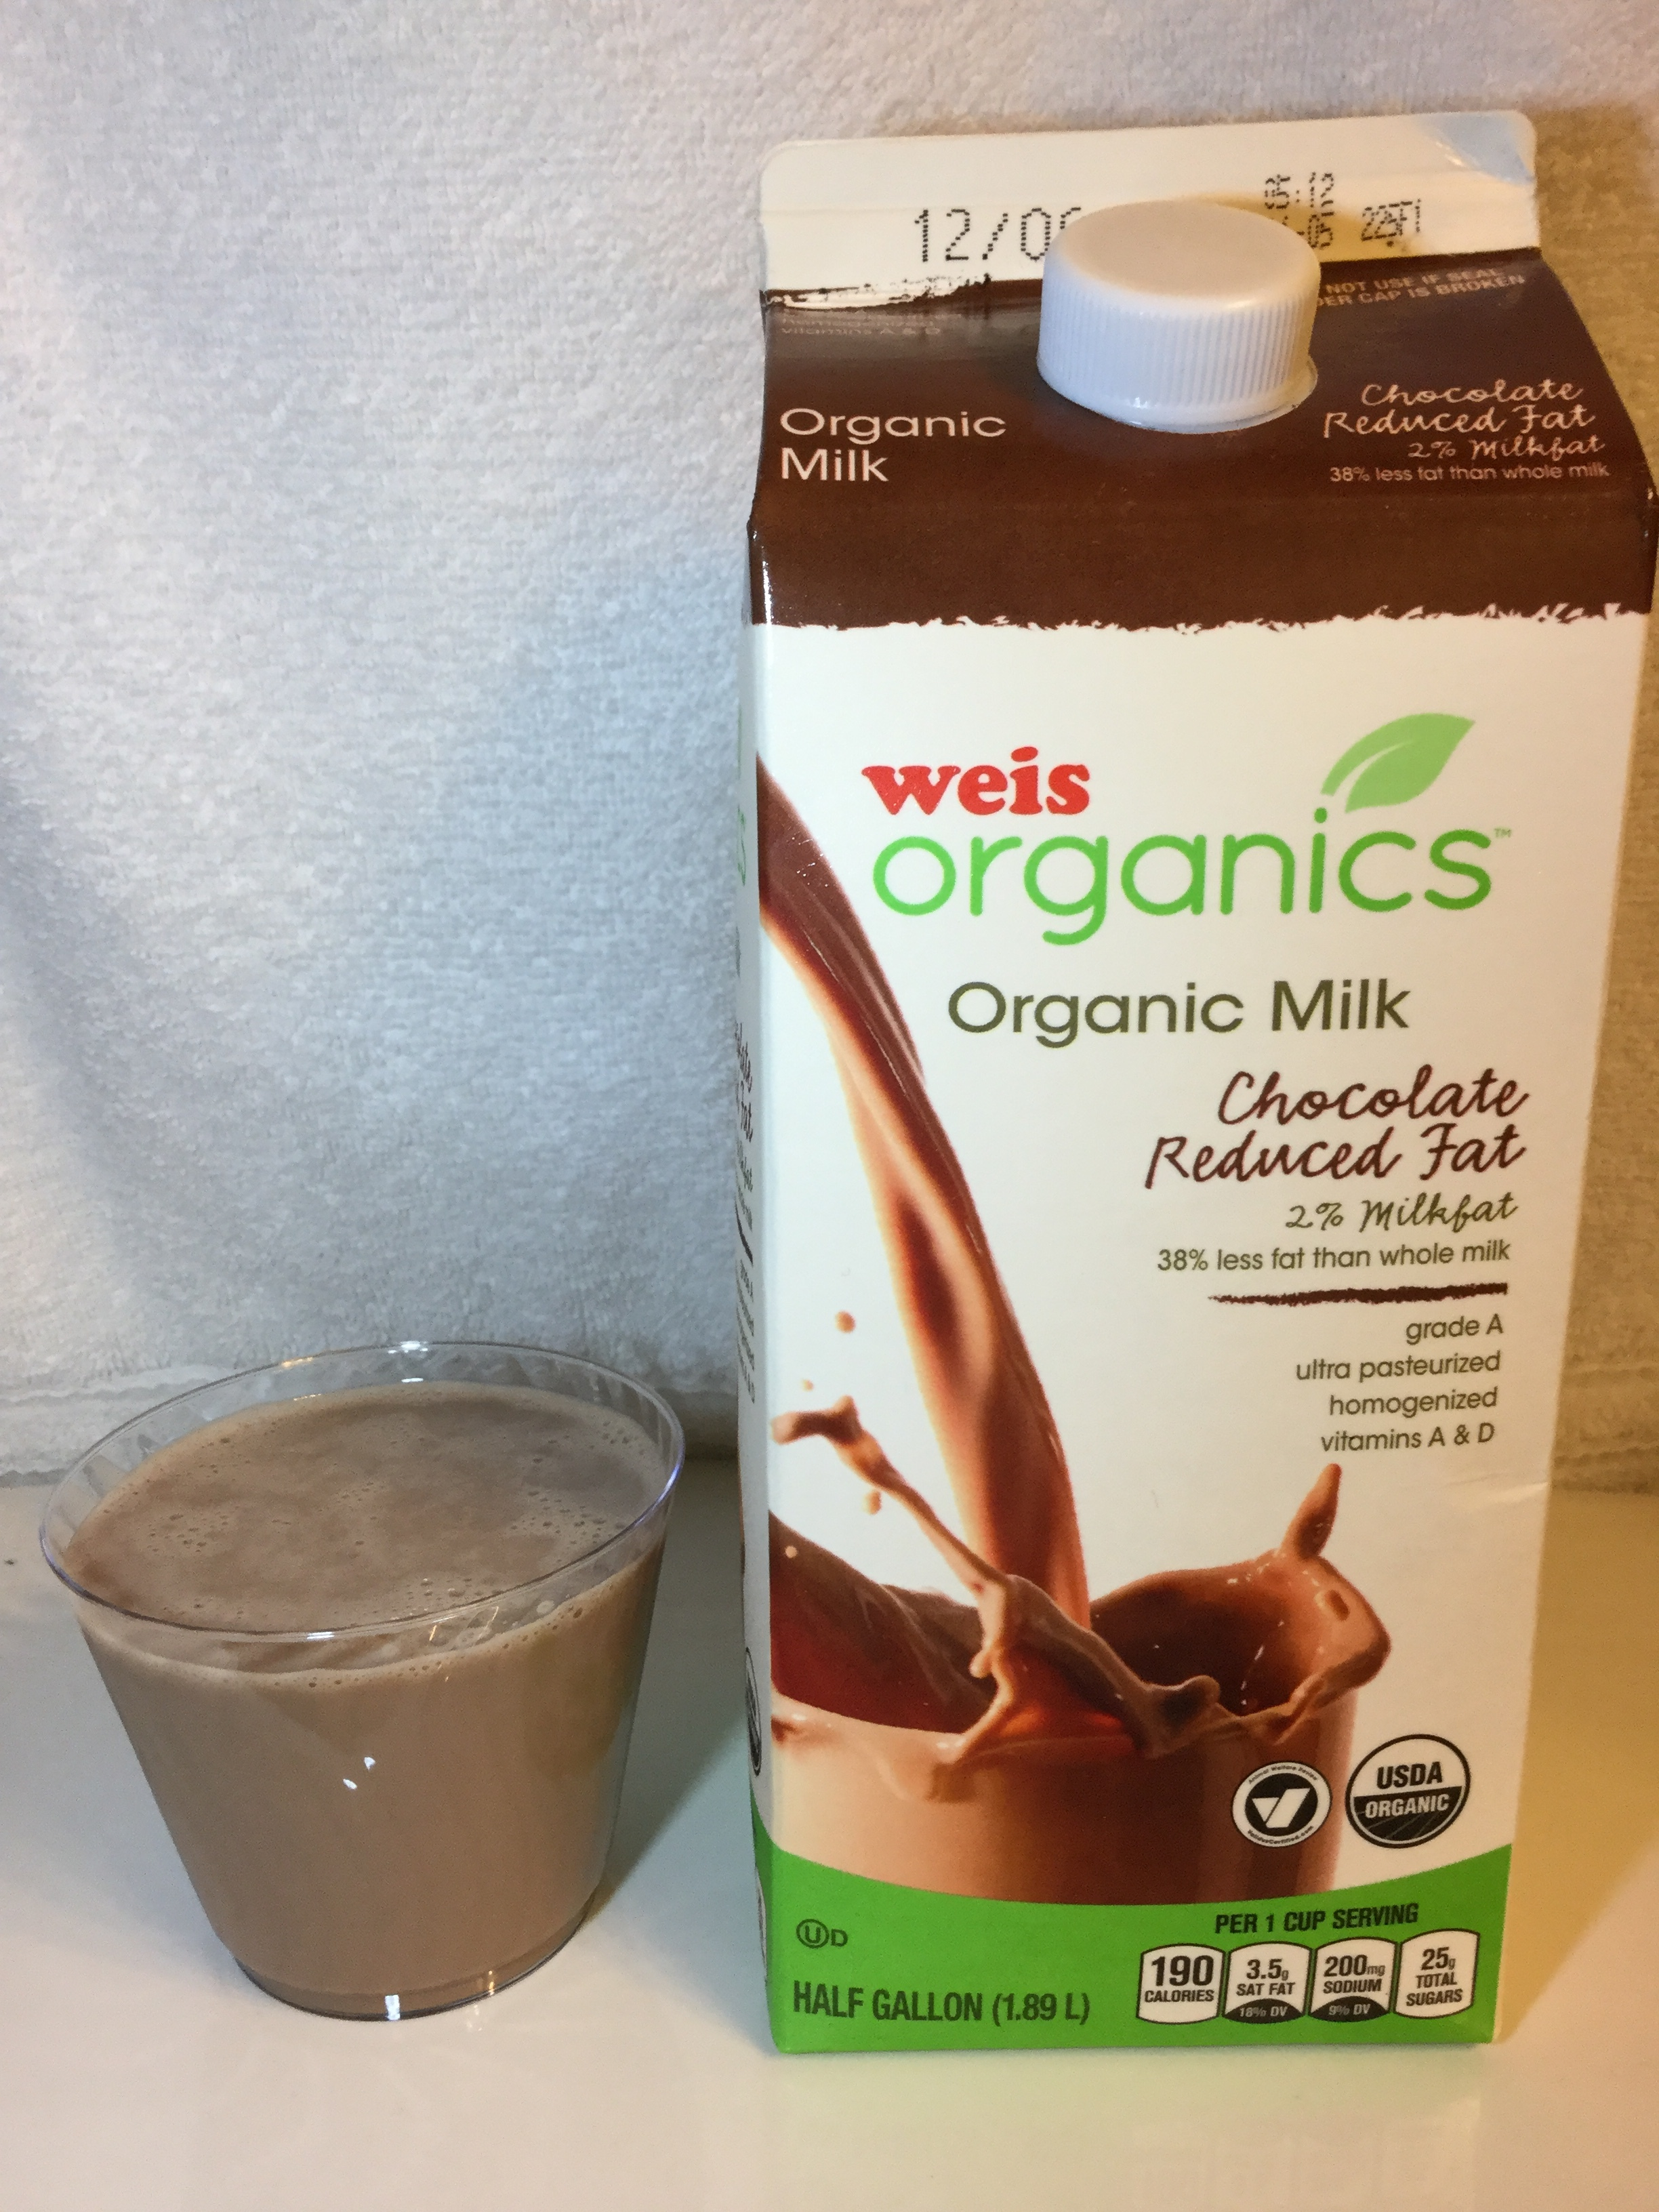 Weis Organics Reduced Fat Chocolate Milk Cup